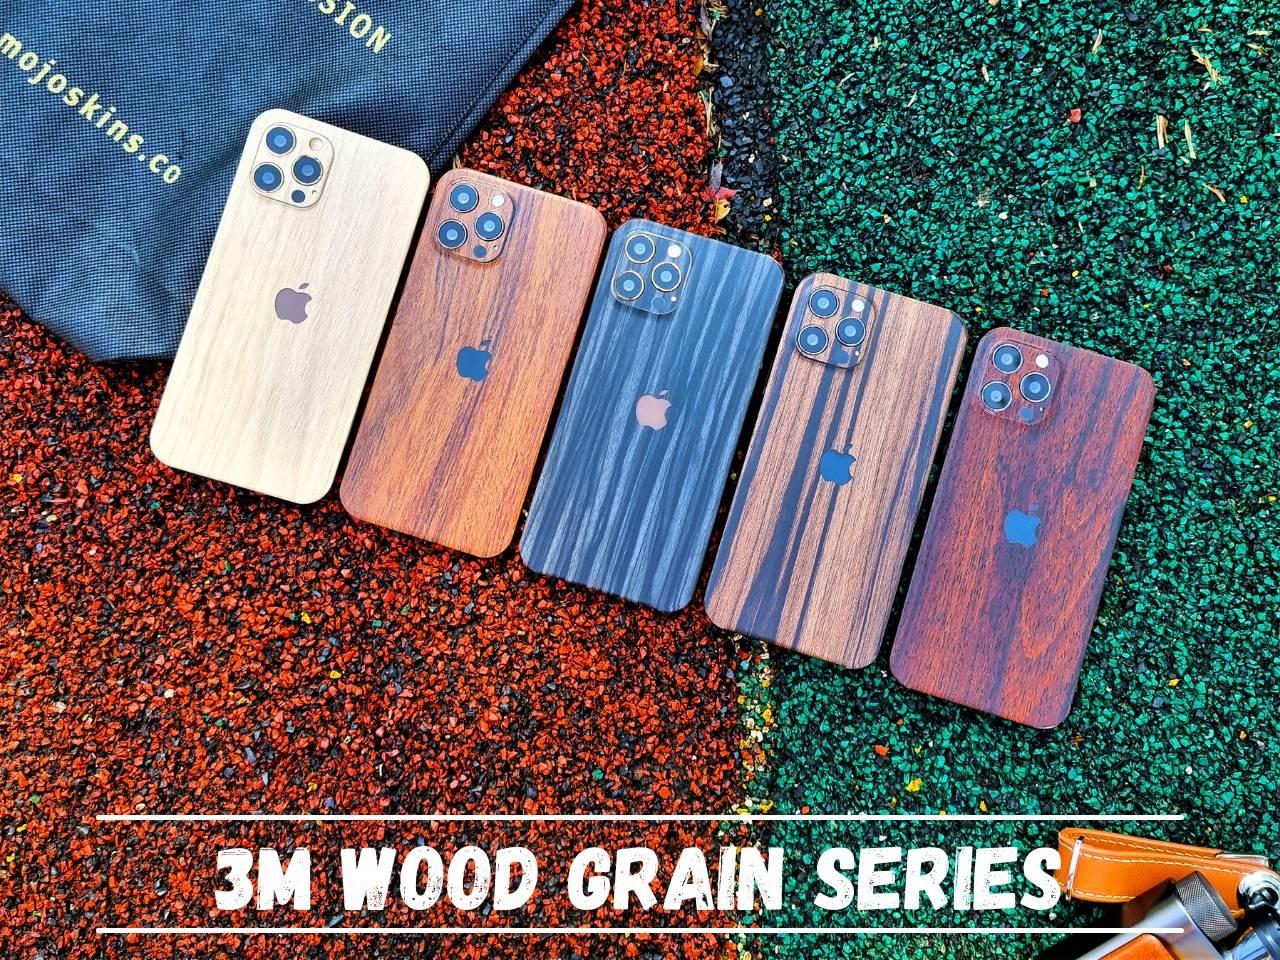 Mojoskins 3M Wood Grain Series